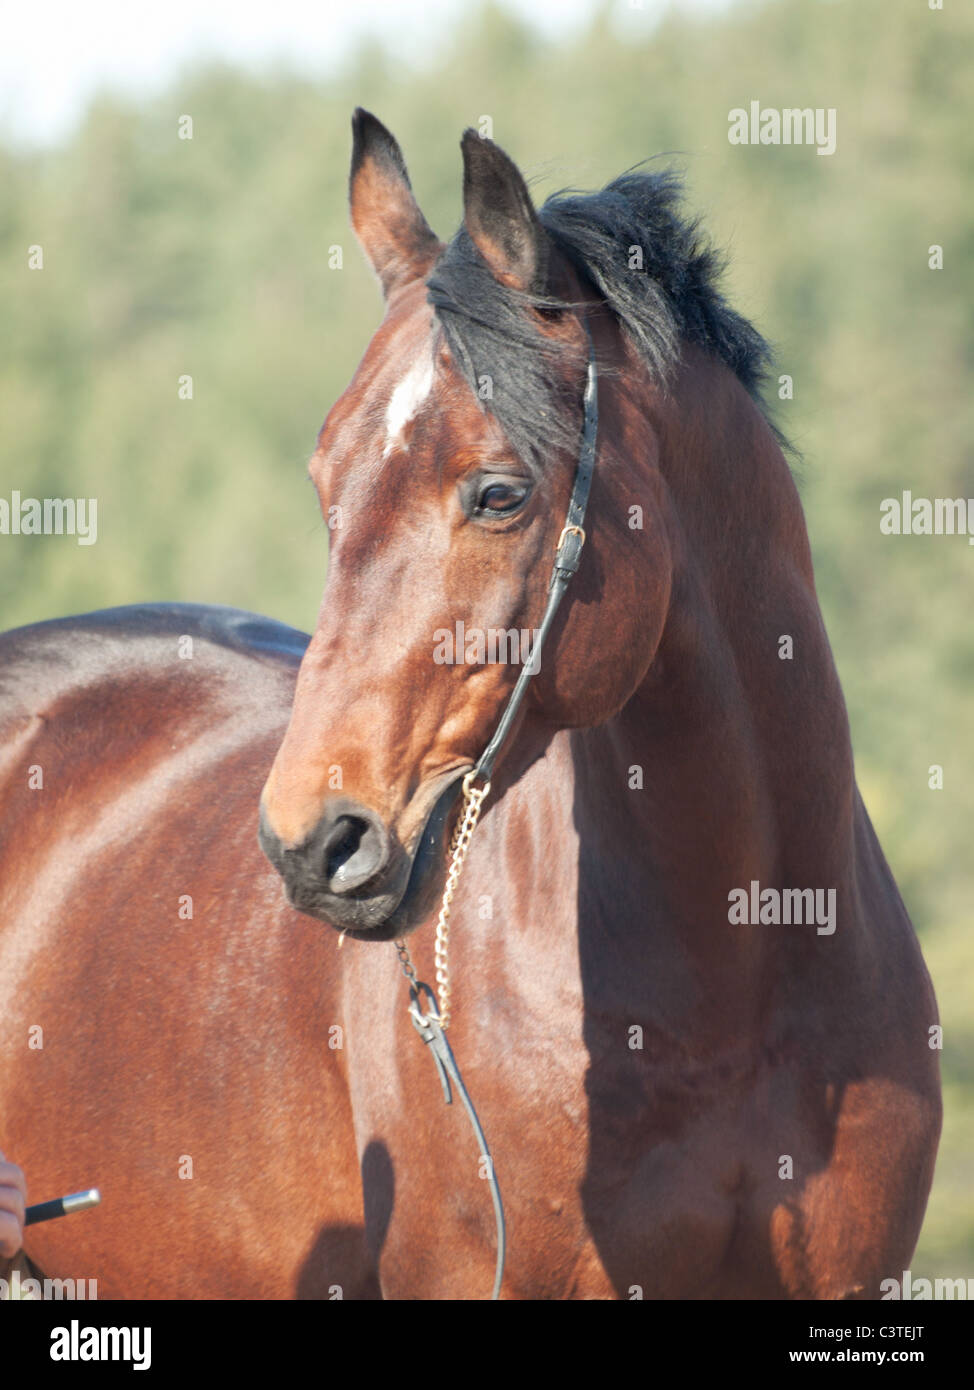 portrait of beautiful bay horse - Stock Image